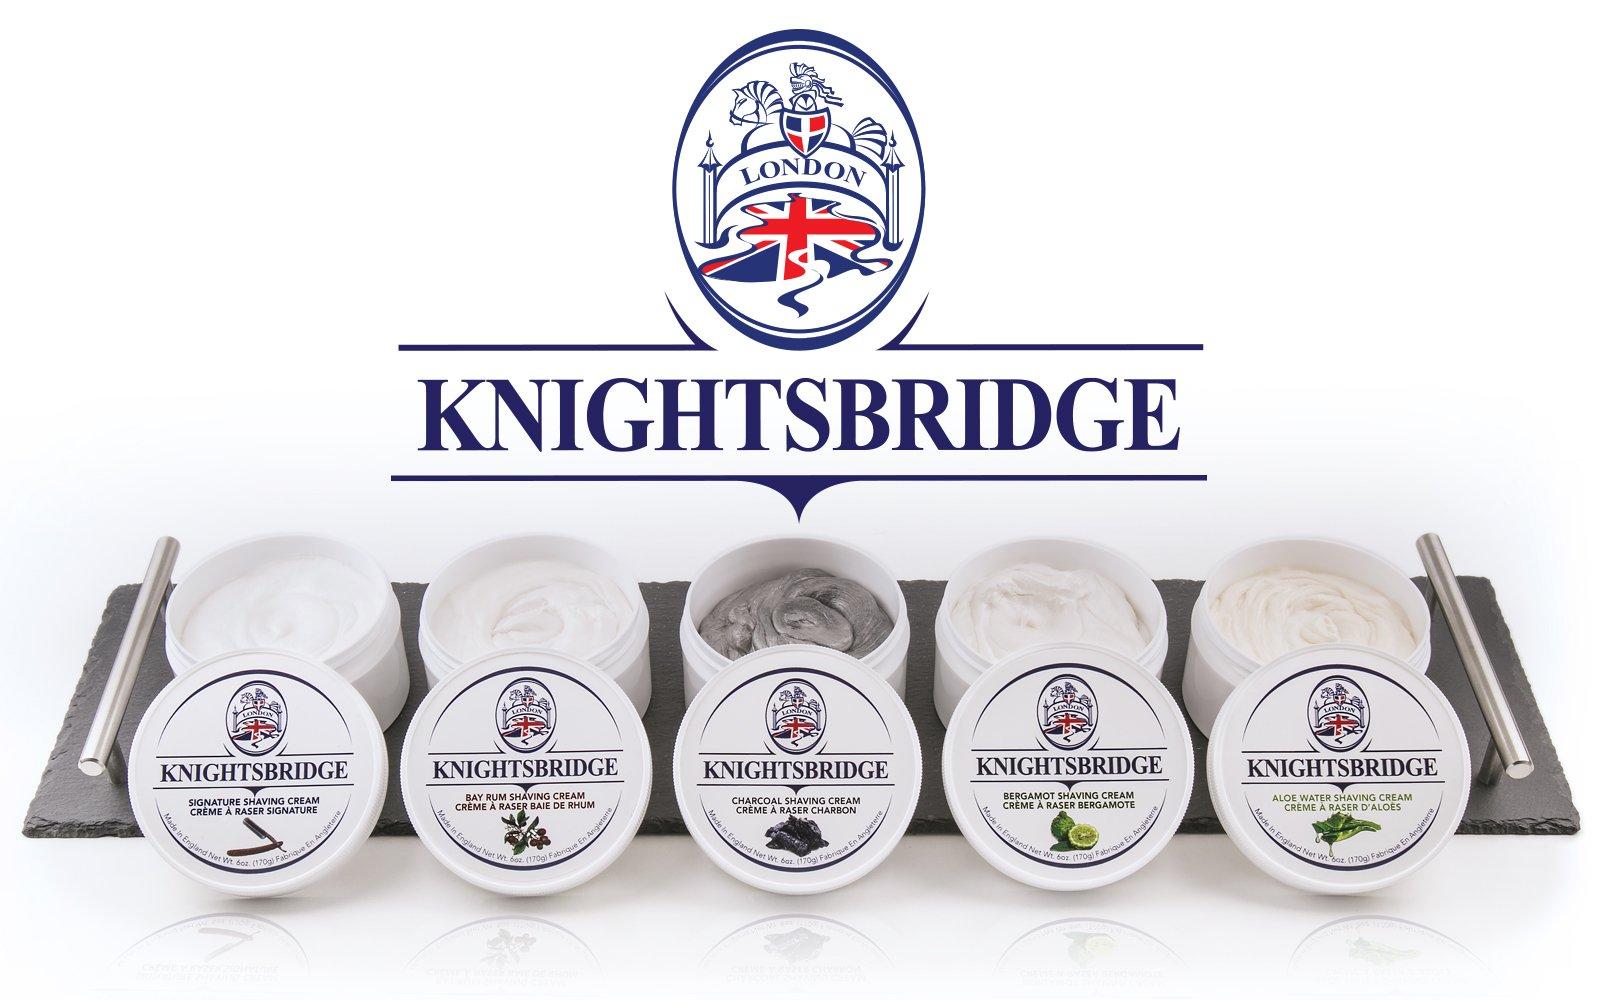 Knightsbridge_Slide2_2000x.progressive